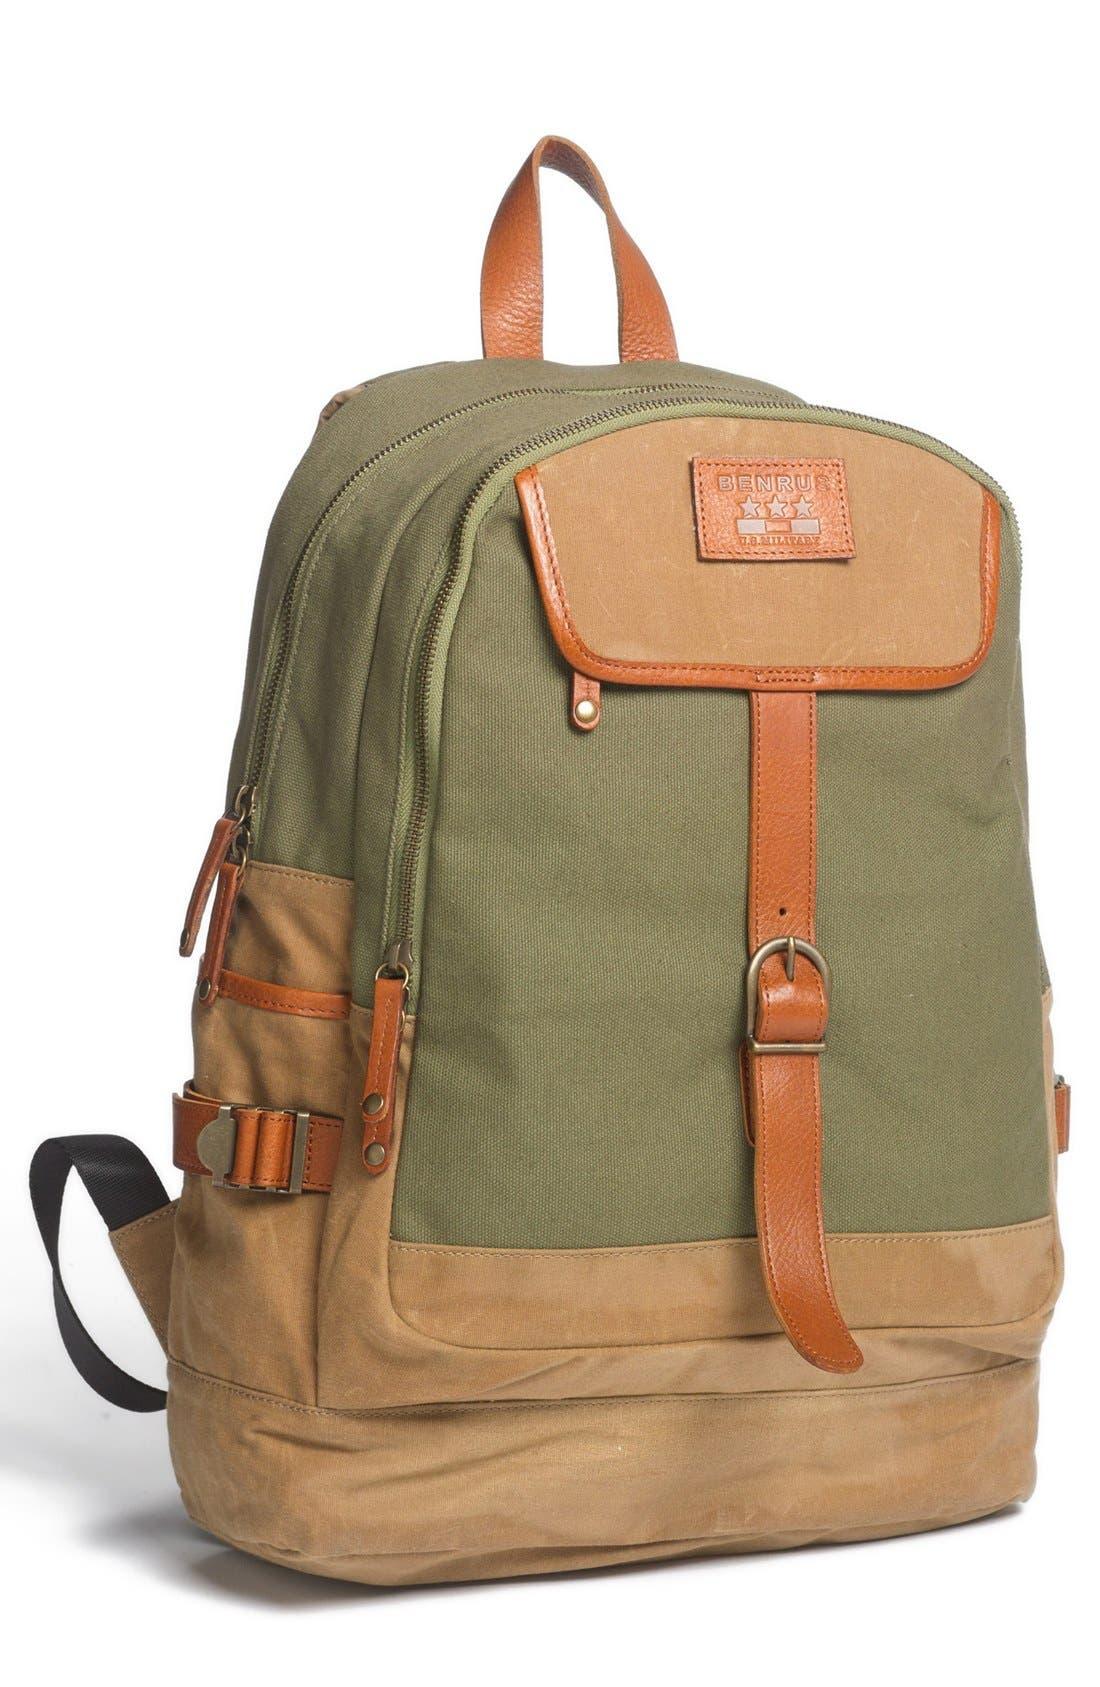 Main Image - Benrus 'Sentry' Backpack